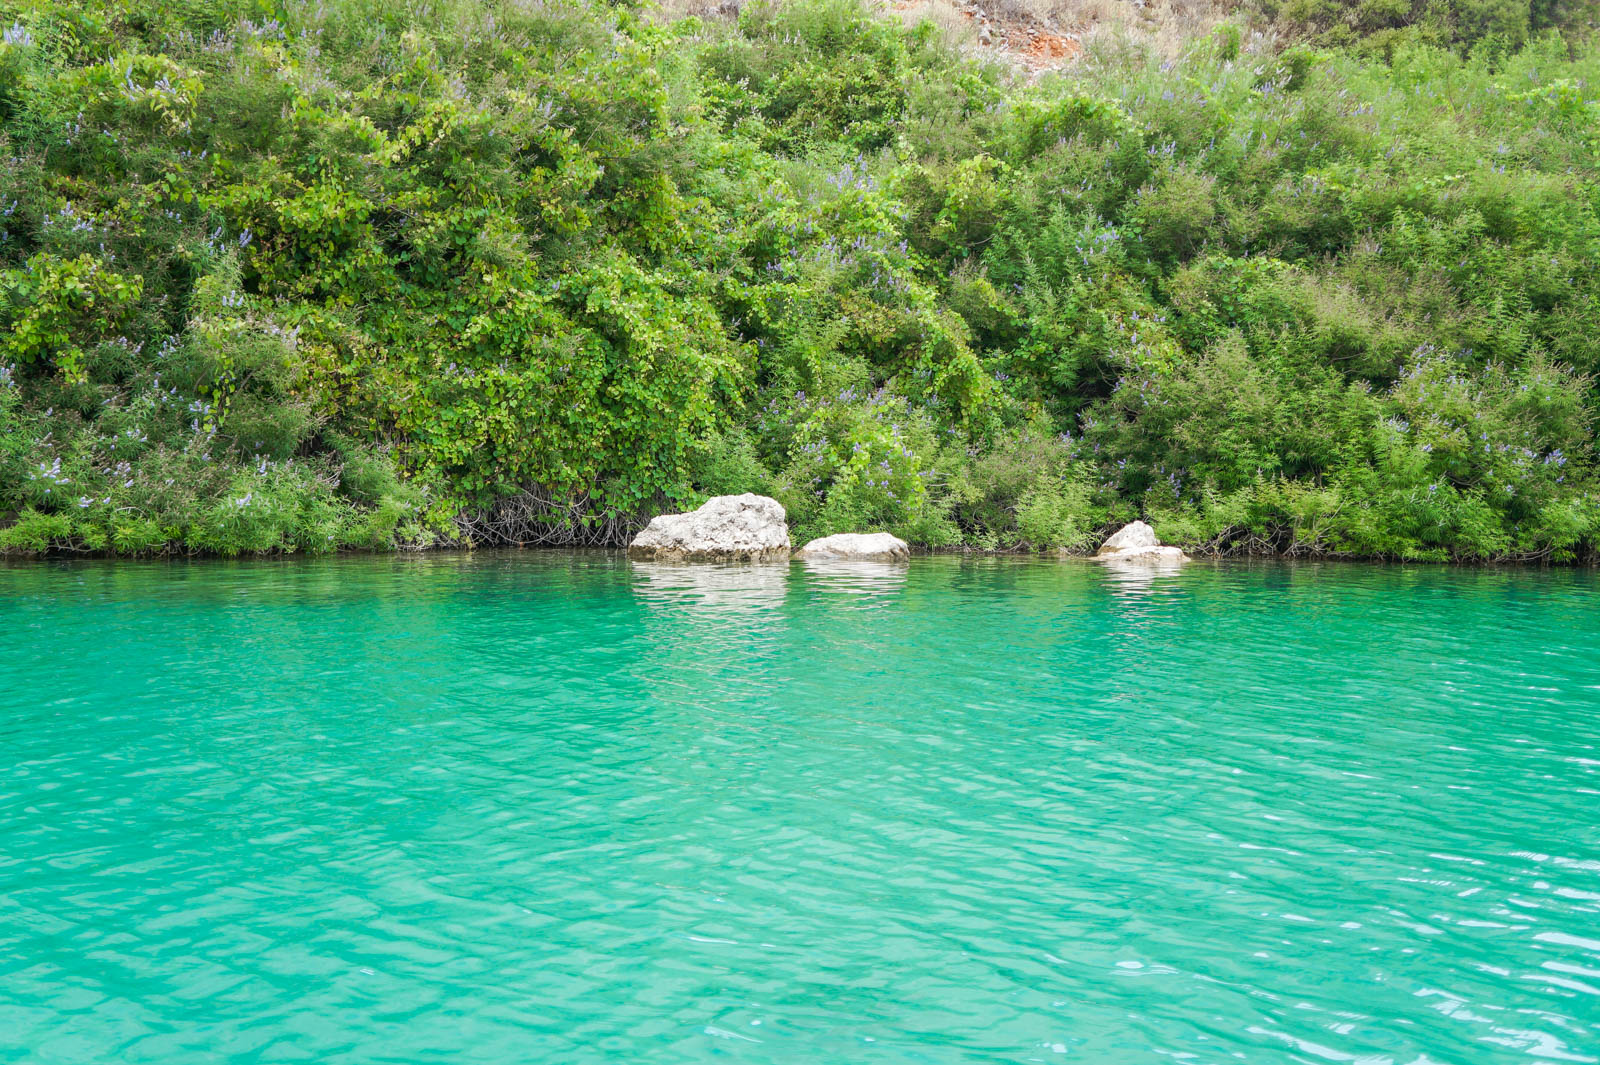 kourna-lake-crete-greece-la-vie-en-blog-all-rights-reserved-2